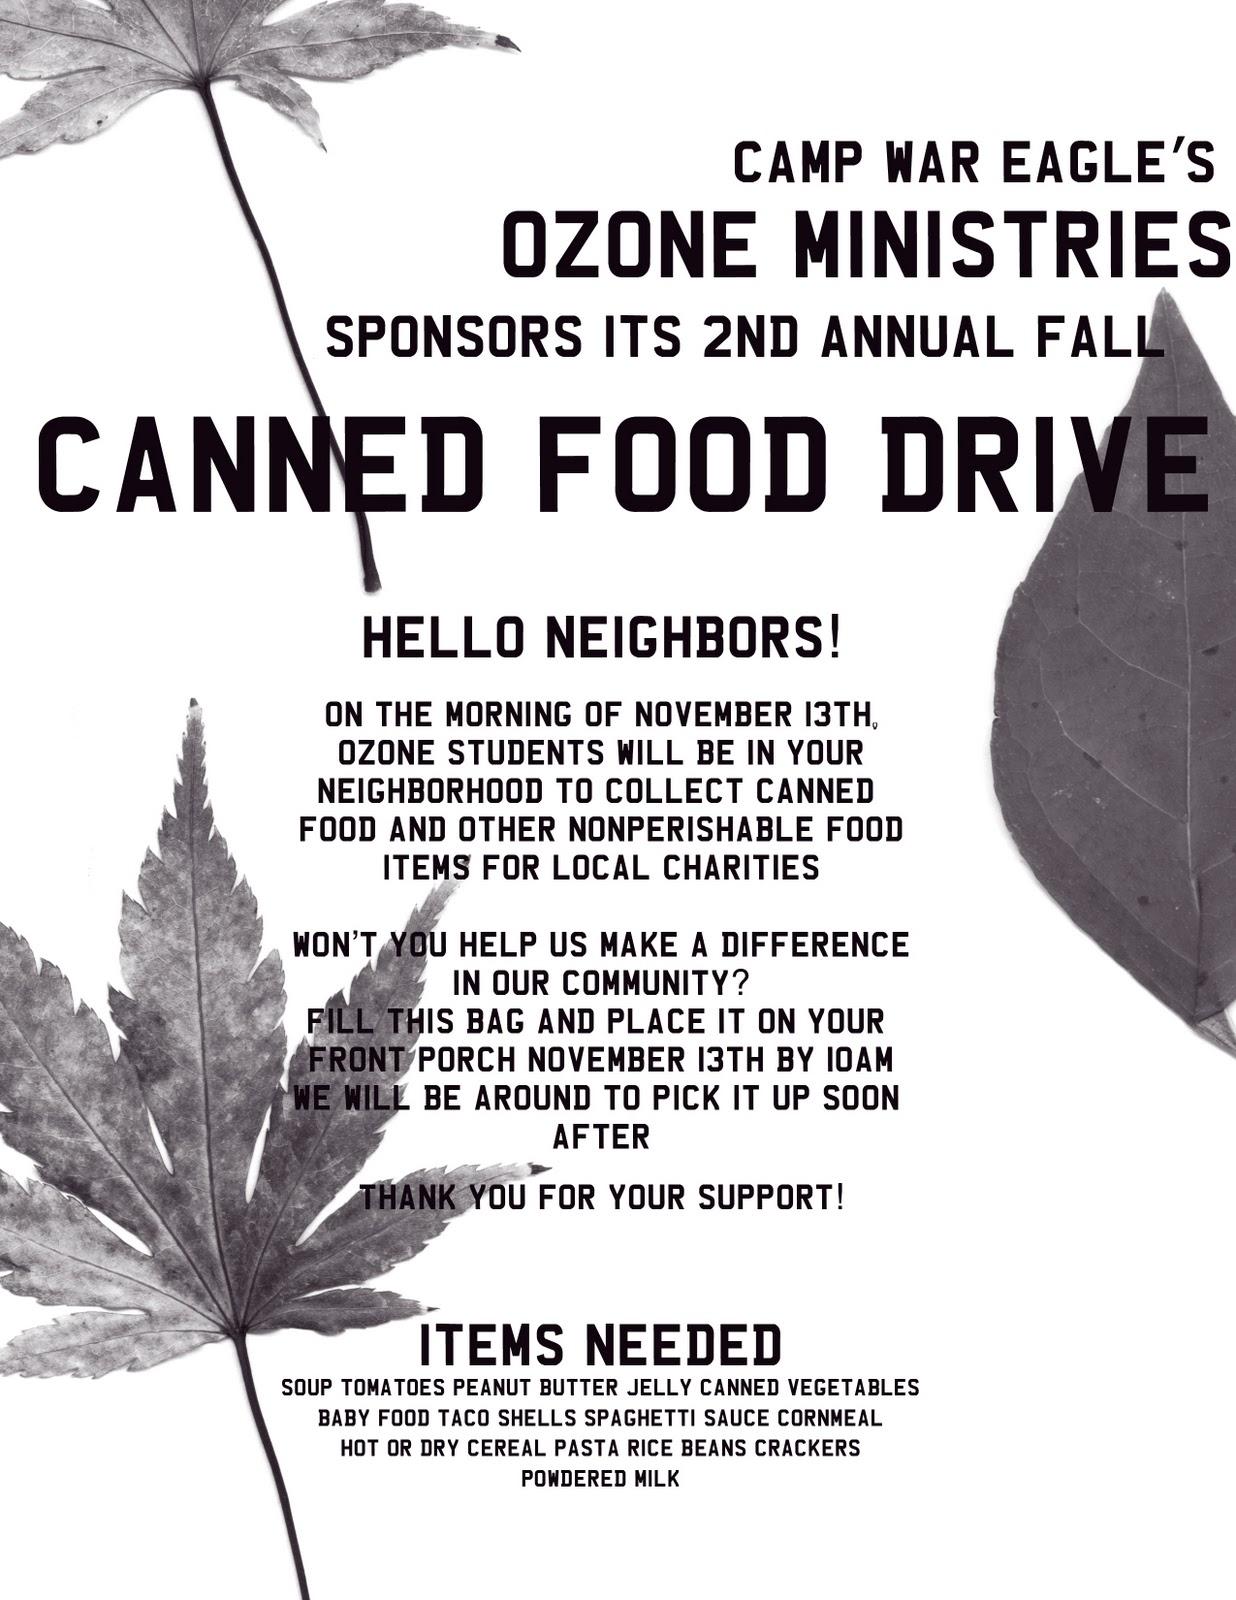 Camp War Eagle 365 Canned Food Drive